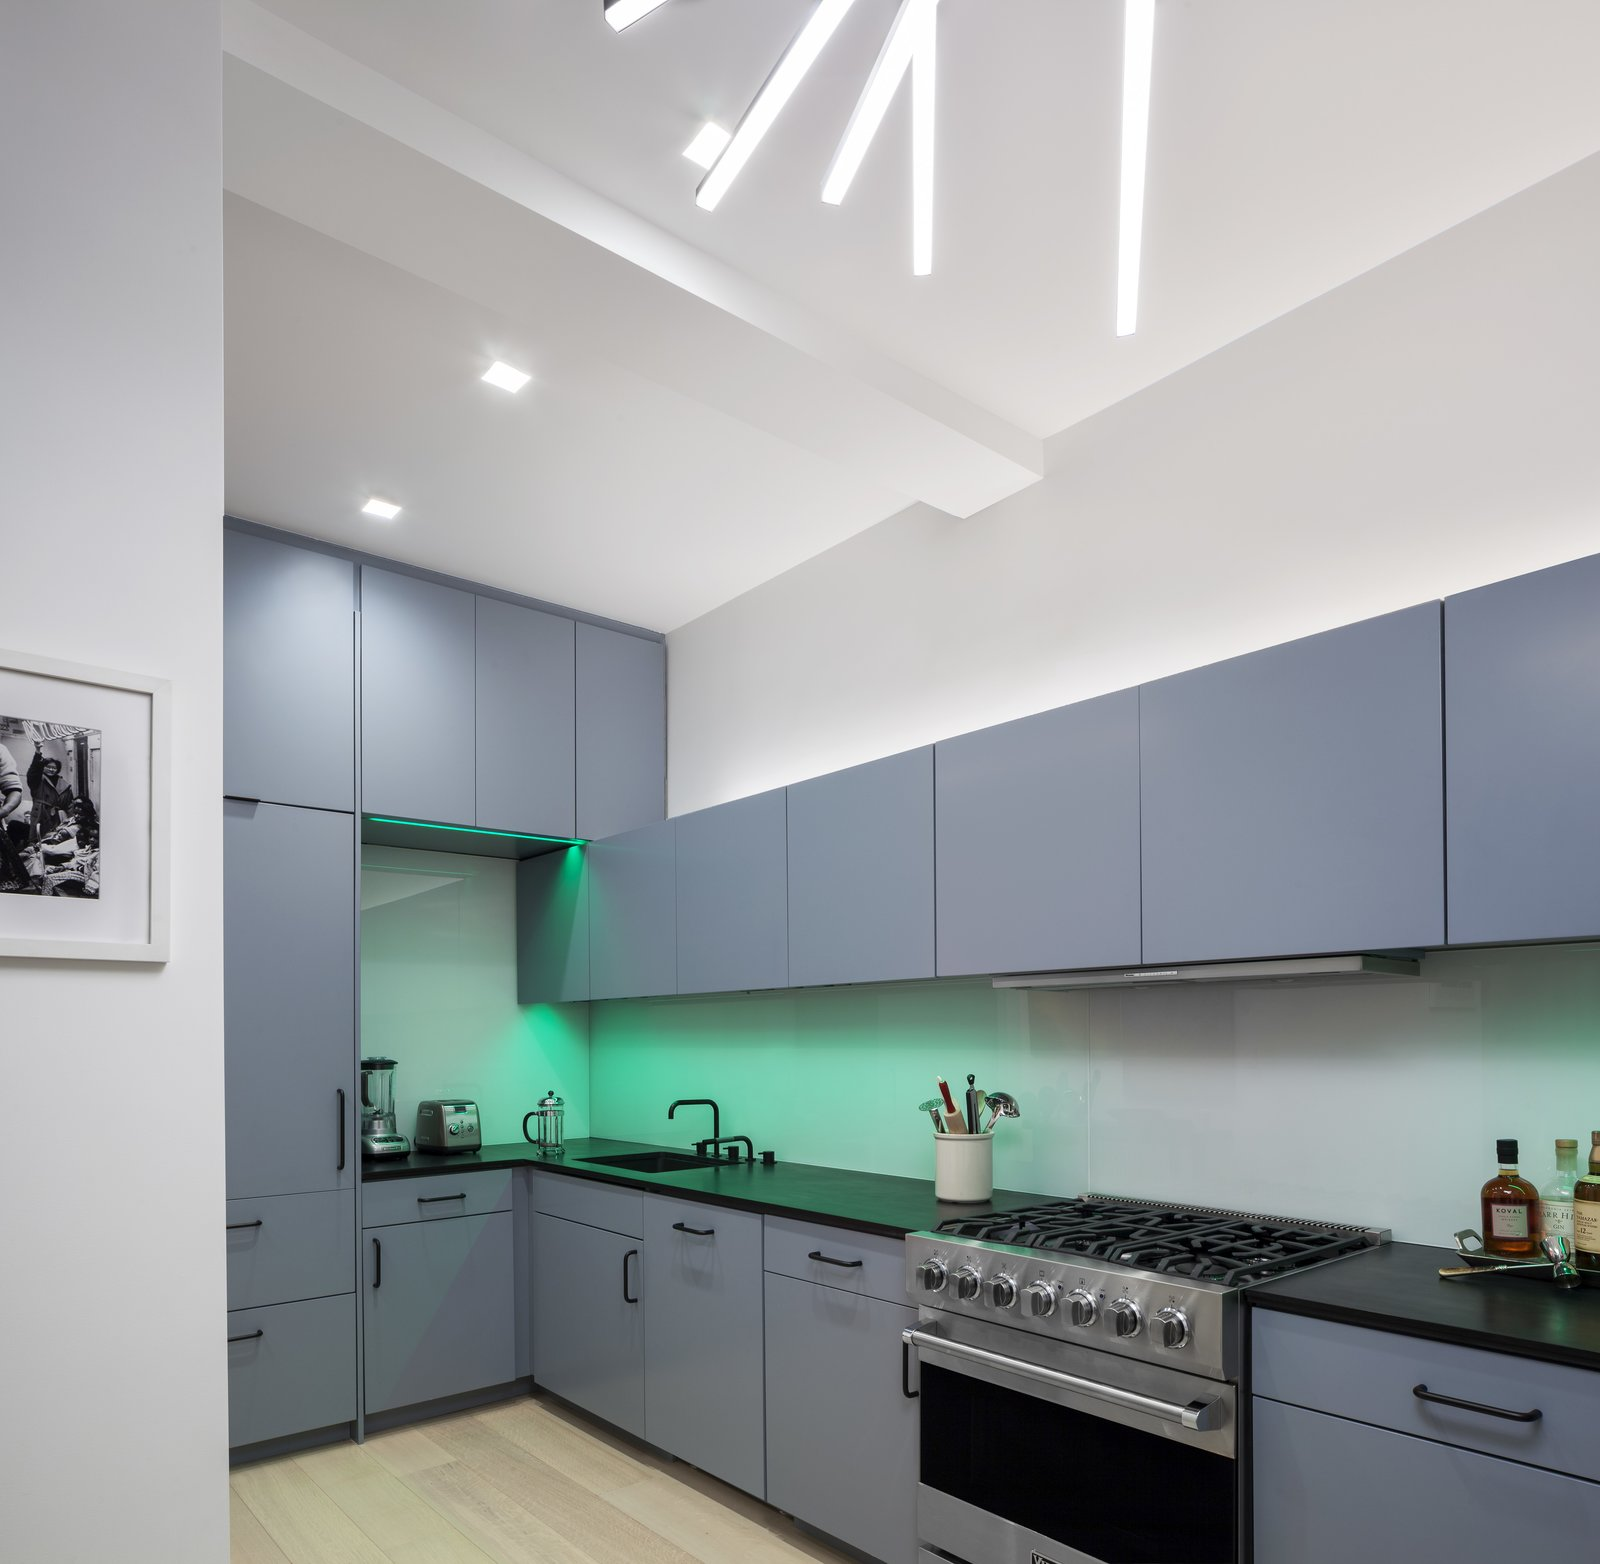 Awesome Kitchen Community Vignette - Kitchen Cabinets | Ideas ...